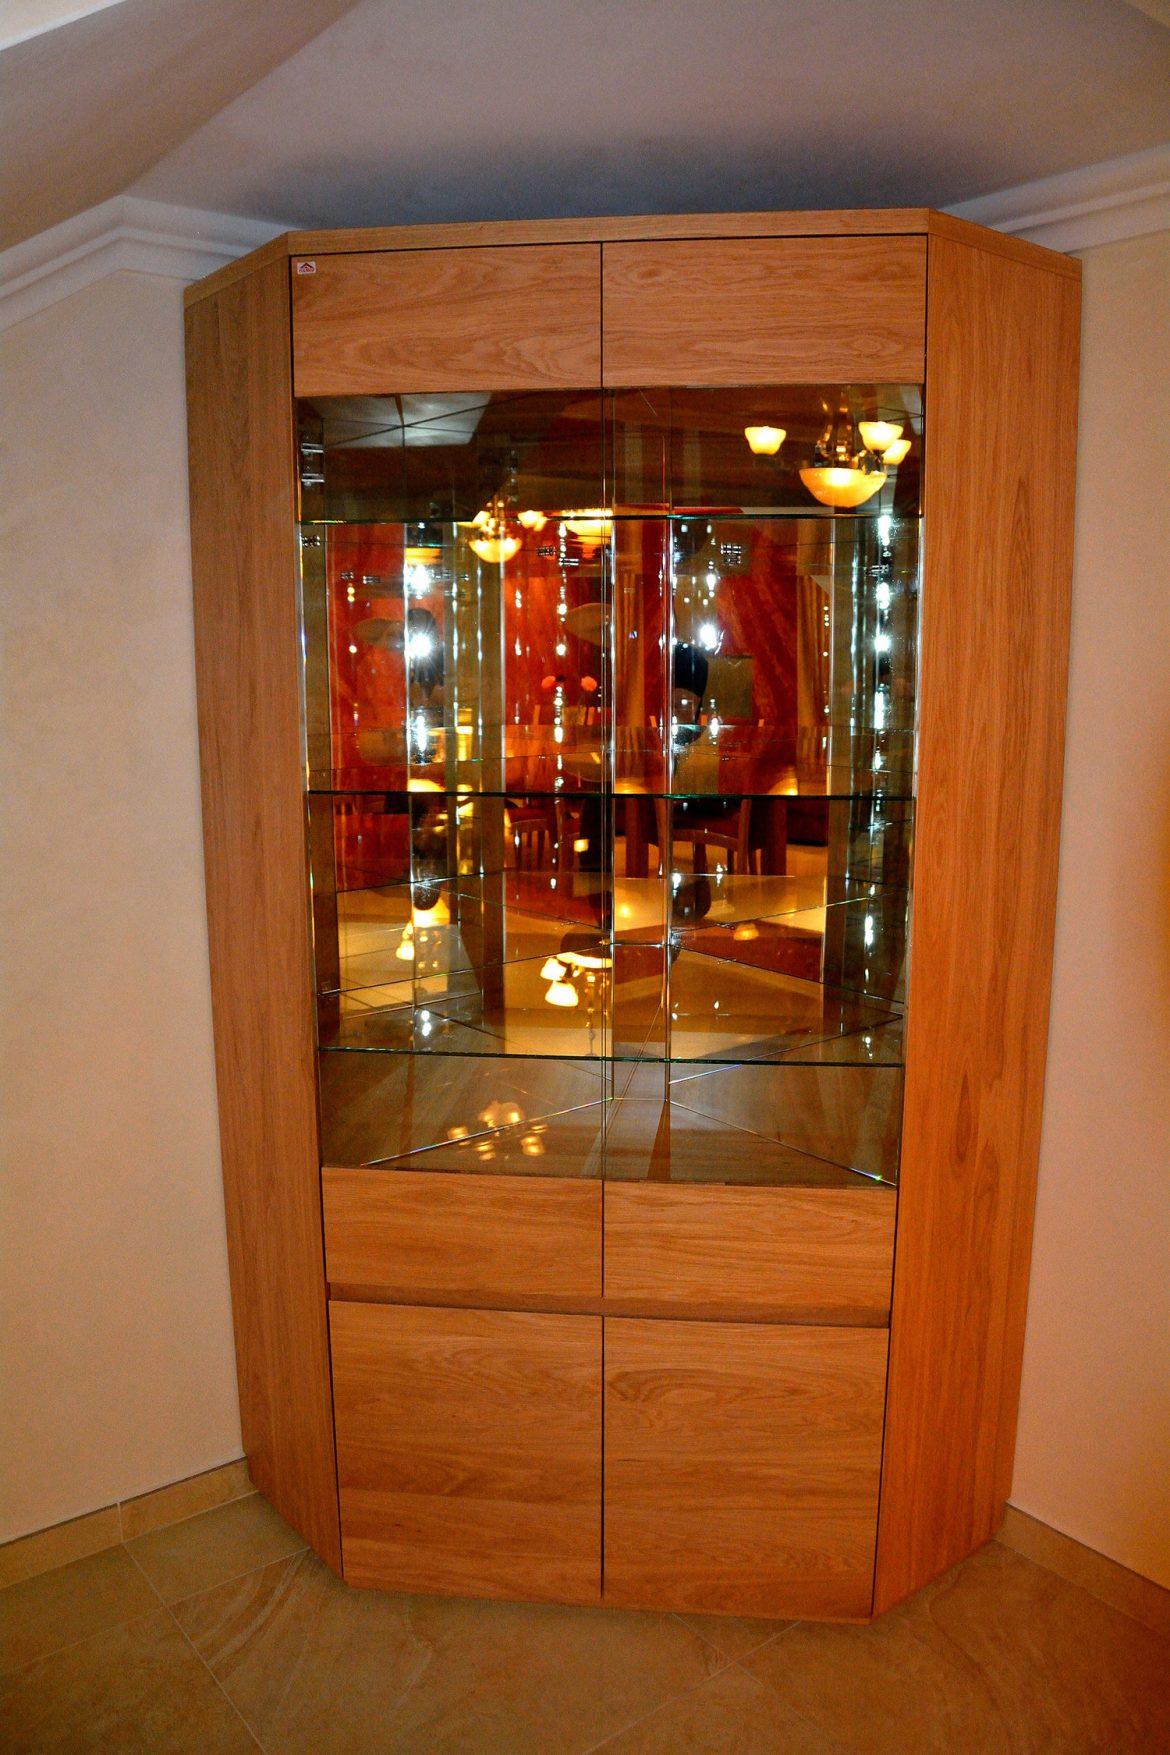 Vitrina realizata complet din lemn masiv stejar natur cu polite interioare din sticla tip oglinda accesorizata cu banda Led